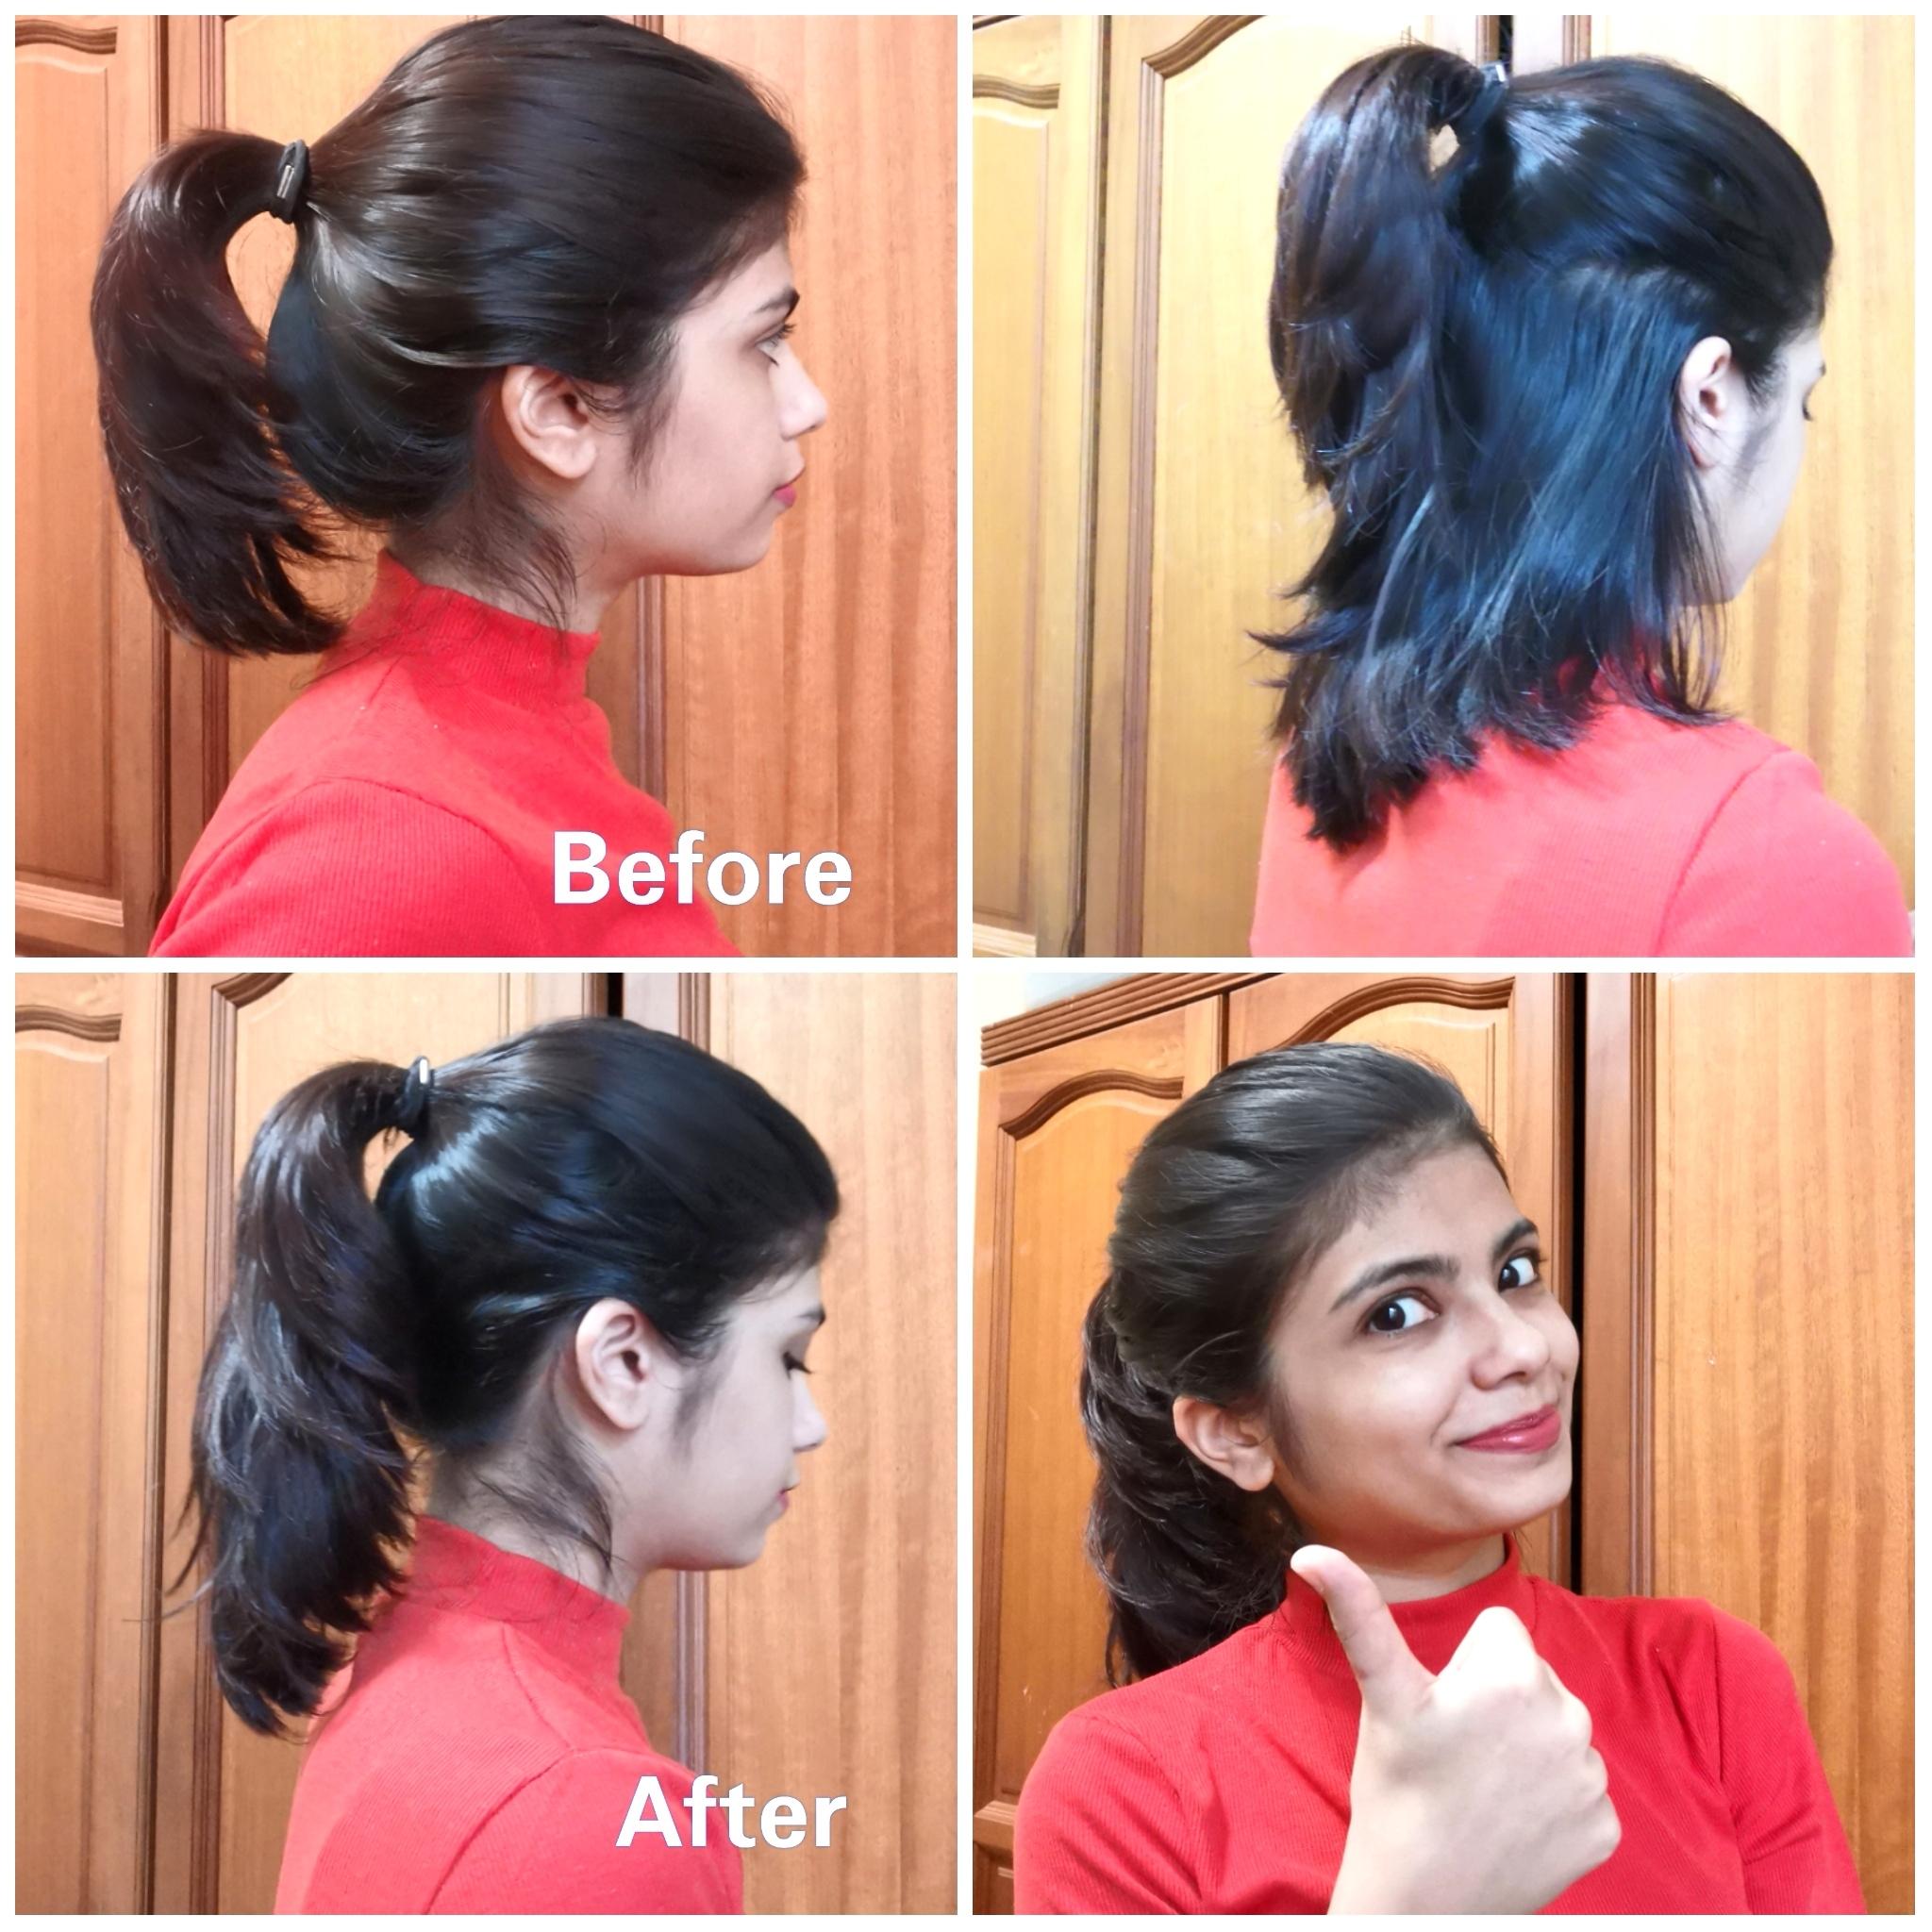 popular hair hacks tested_hair extension